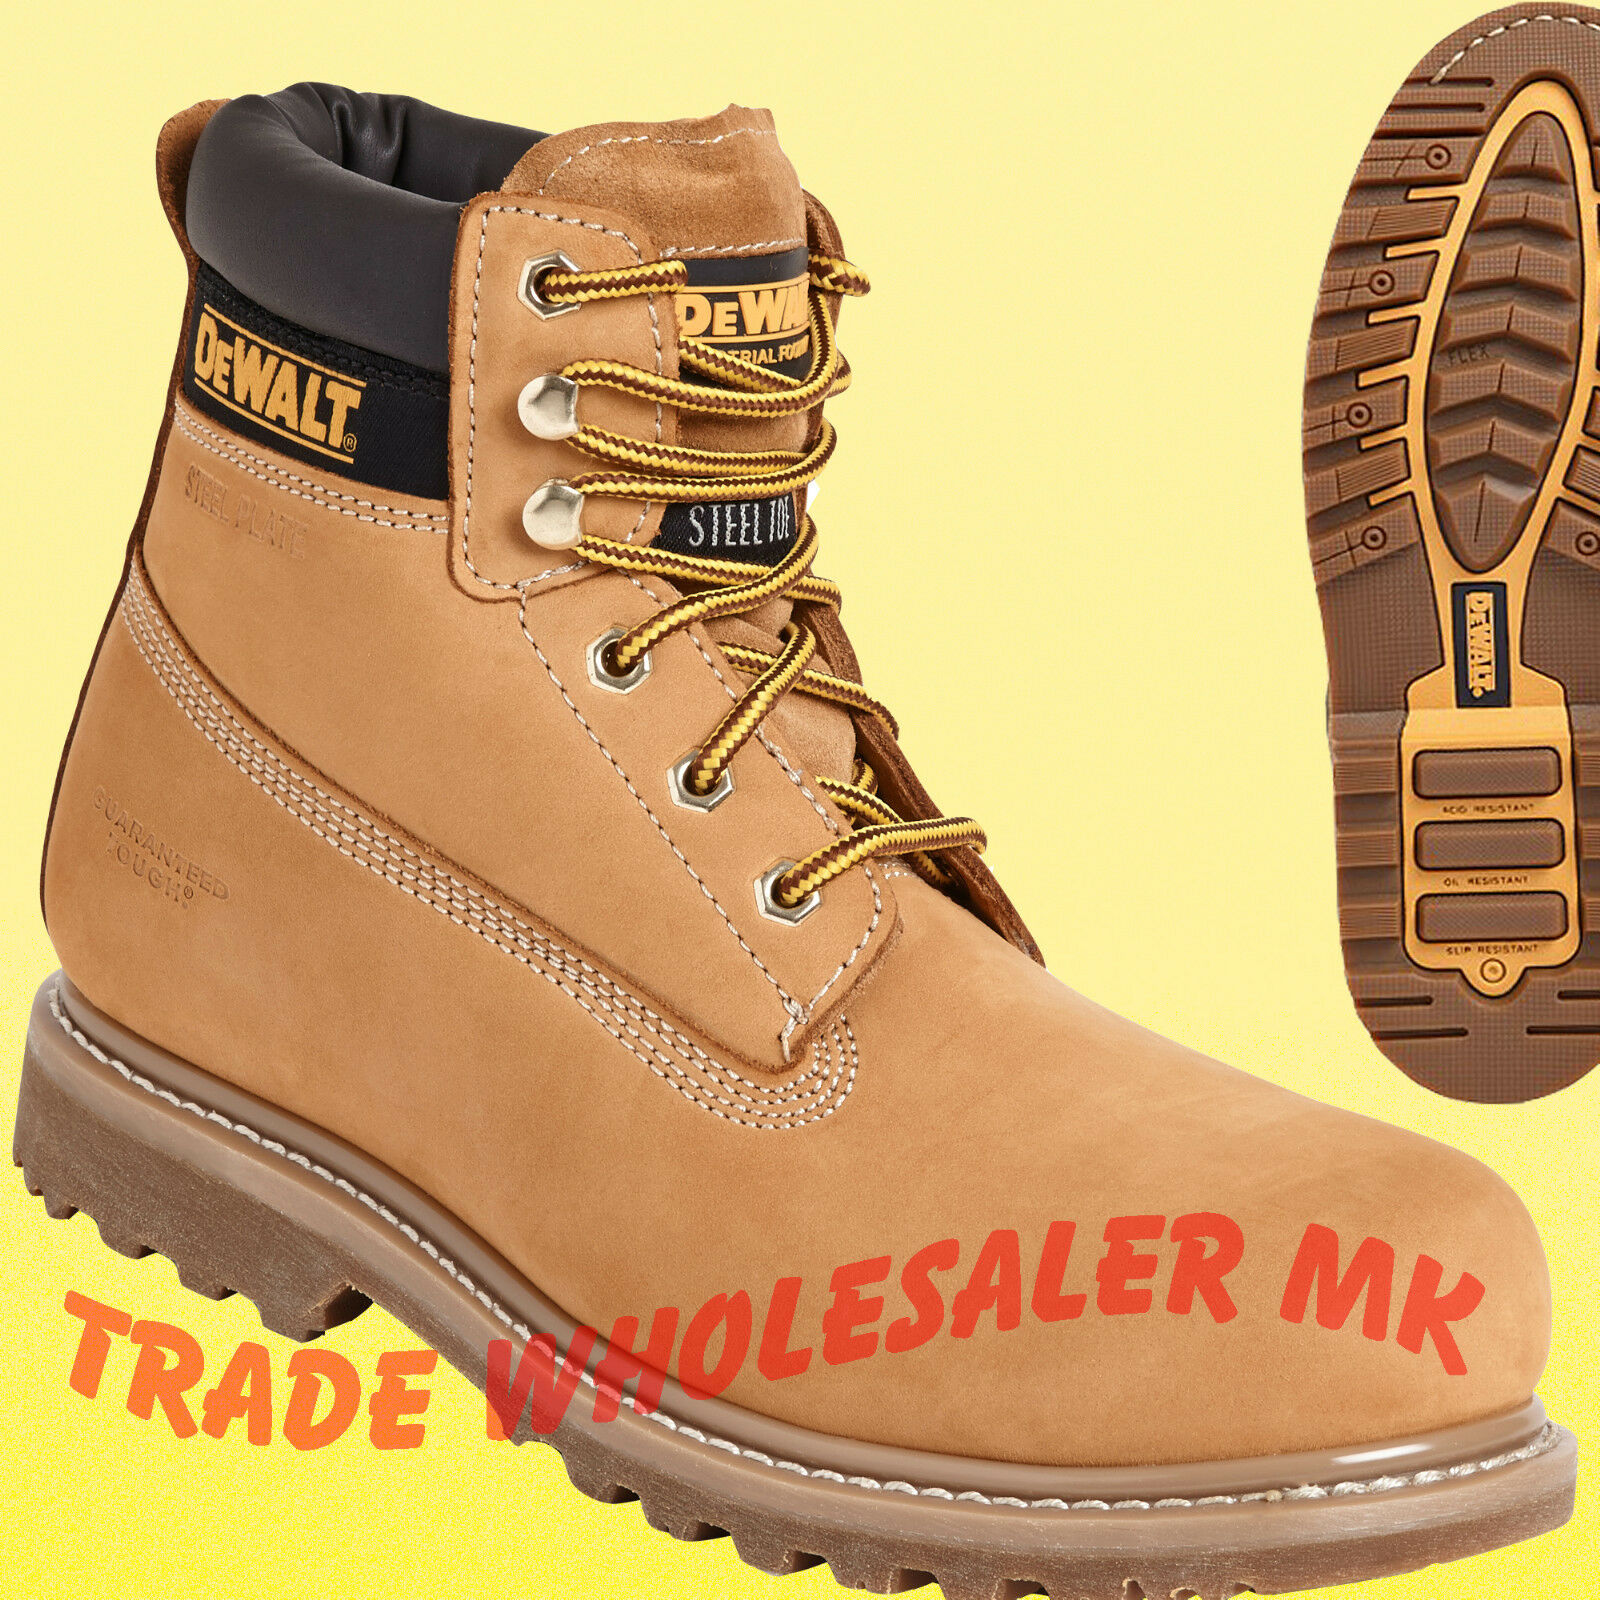 DeWALT EXPLORER HONEY STEEL TOE CAP SAFETY WORK BOOT size 7,8,9,10,11,12